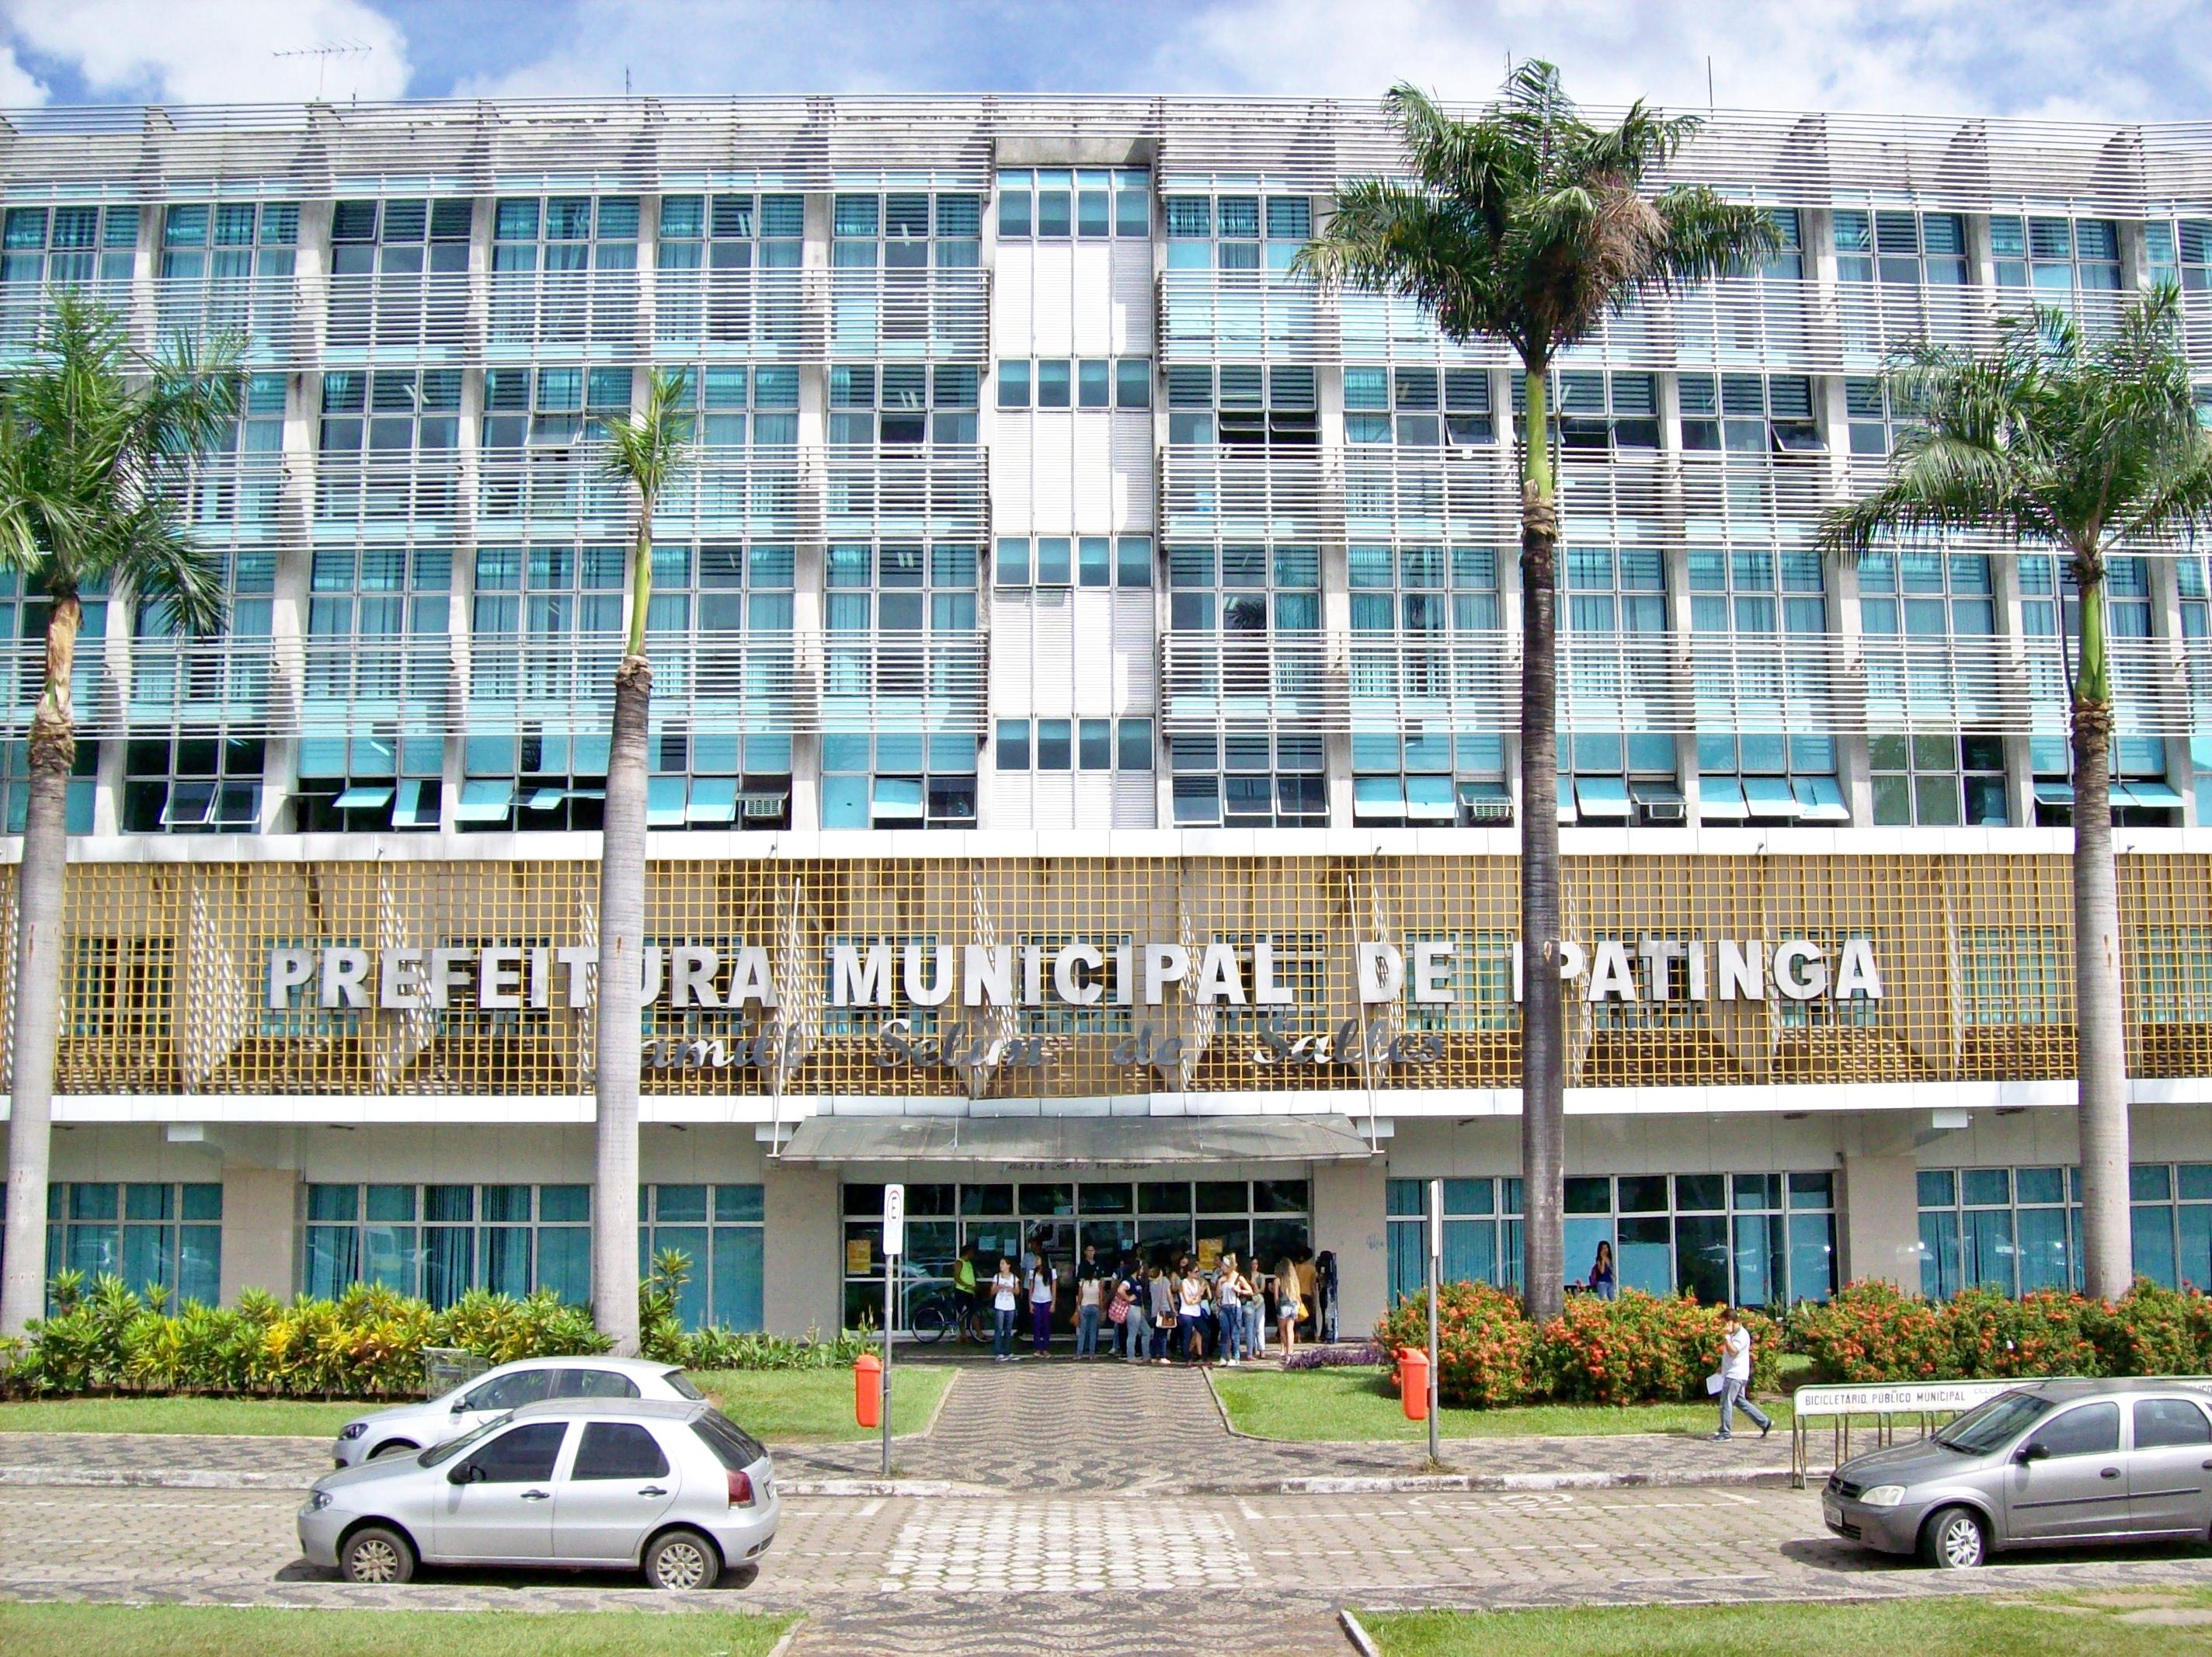 Edifcio Jamil Selim José de Sales sede da prefeitura de Ipatinga